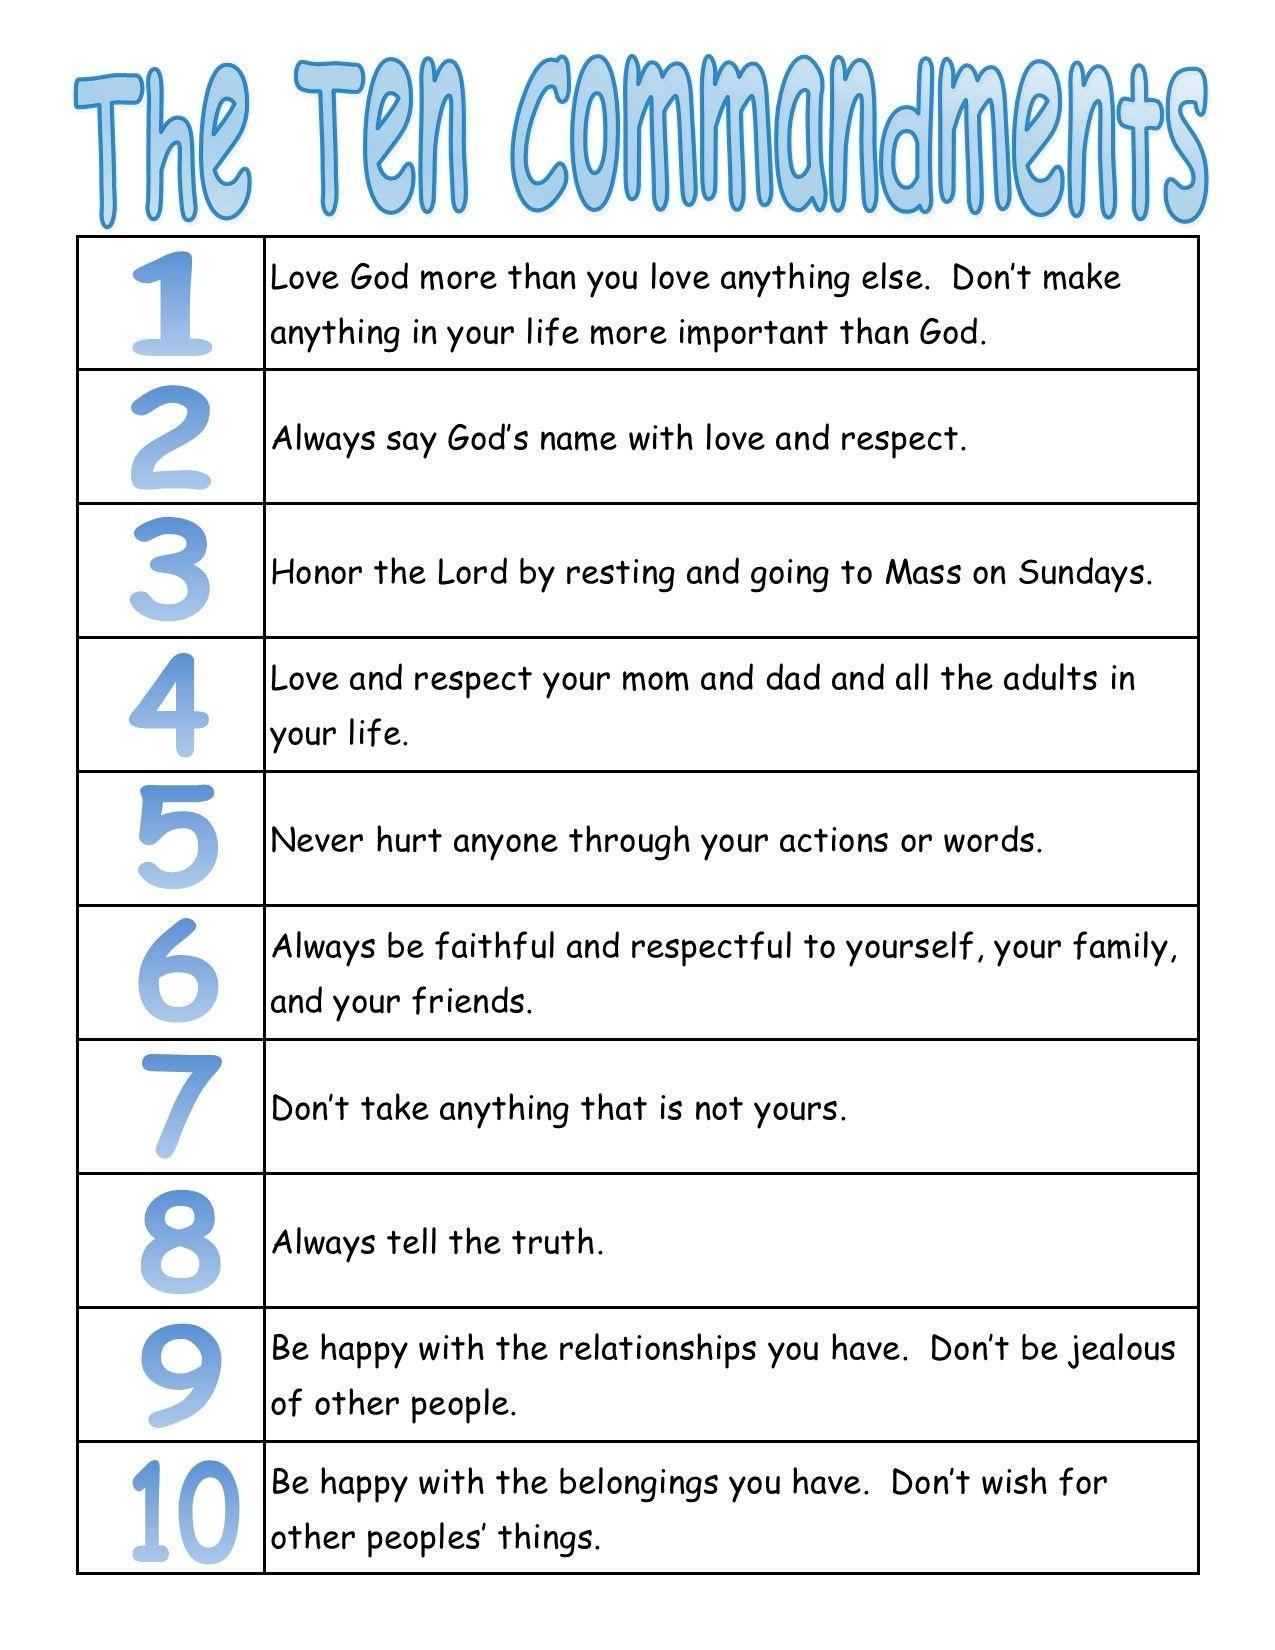 A True Catholic Version Of The Ten Commandments, For Kids | The - Free Catholic Ten Commandments Printable